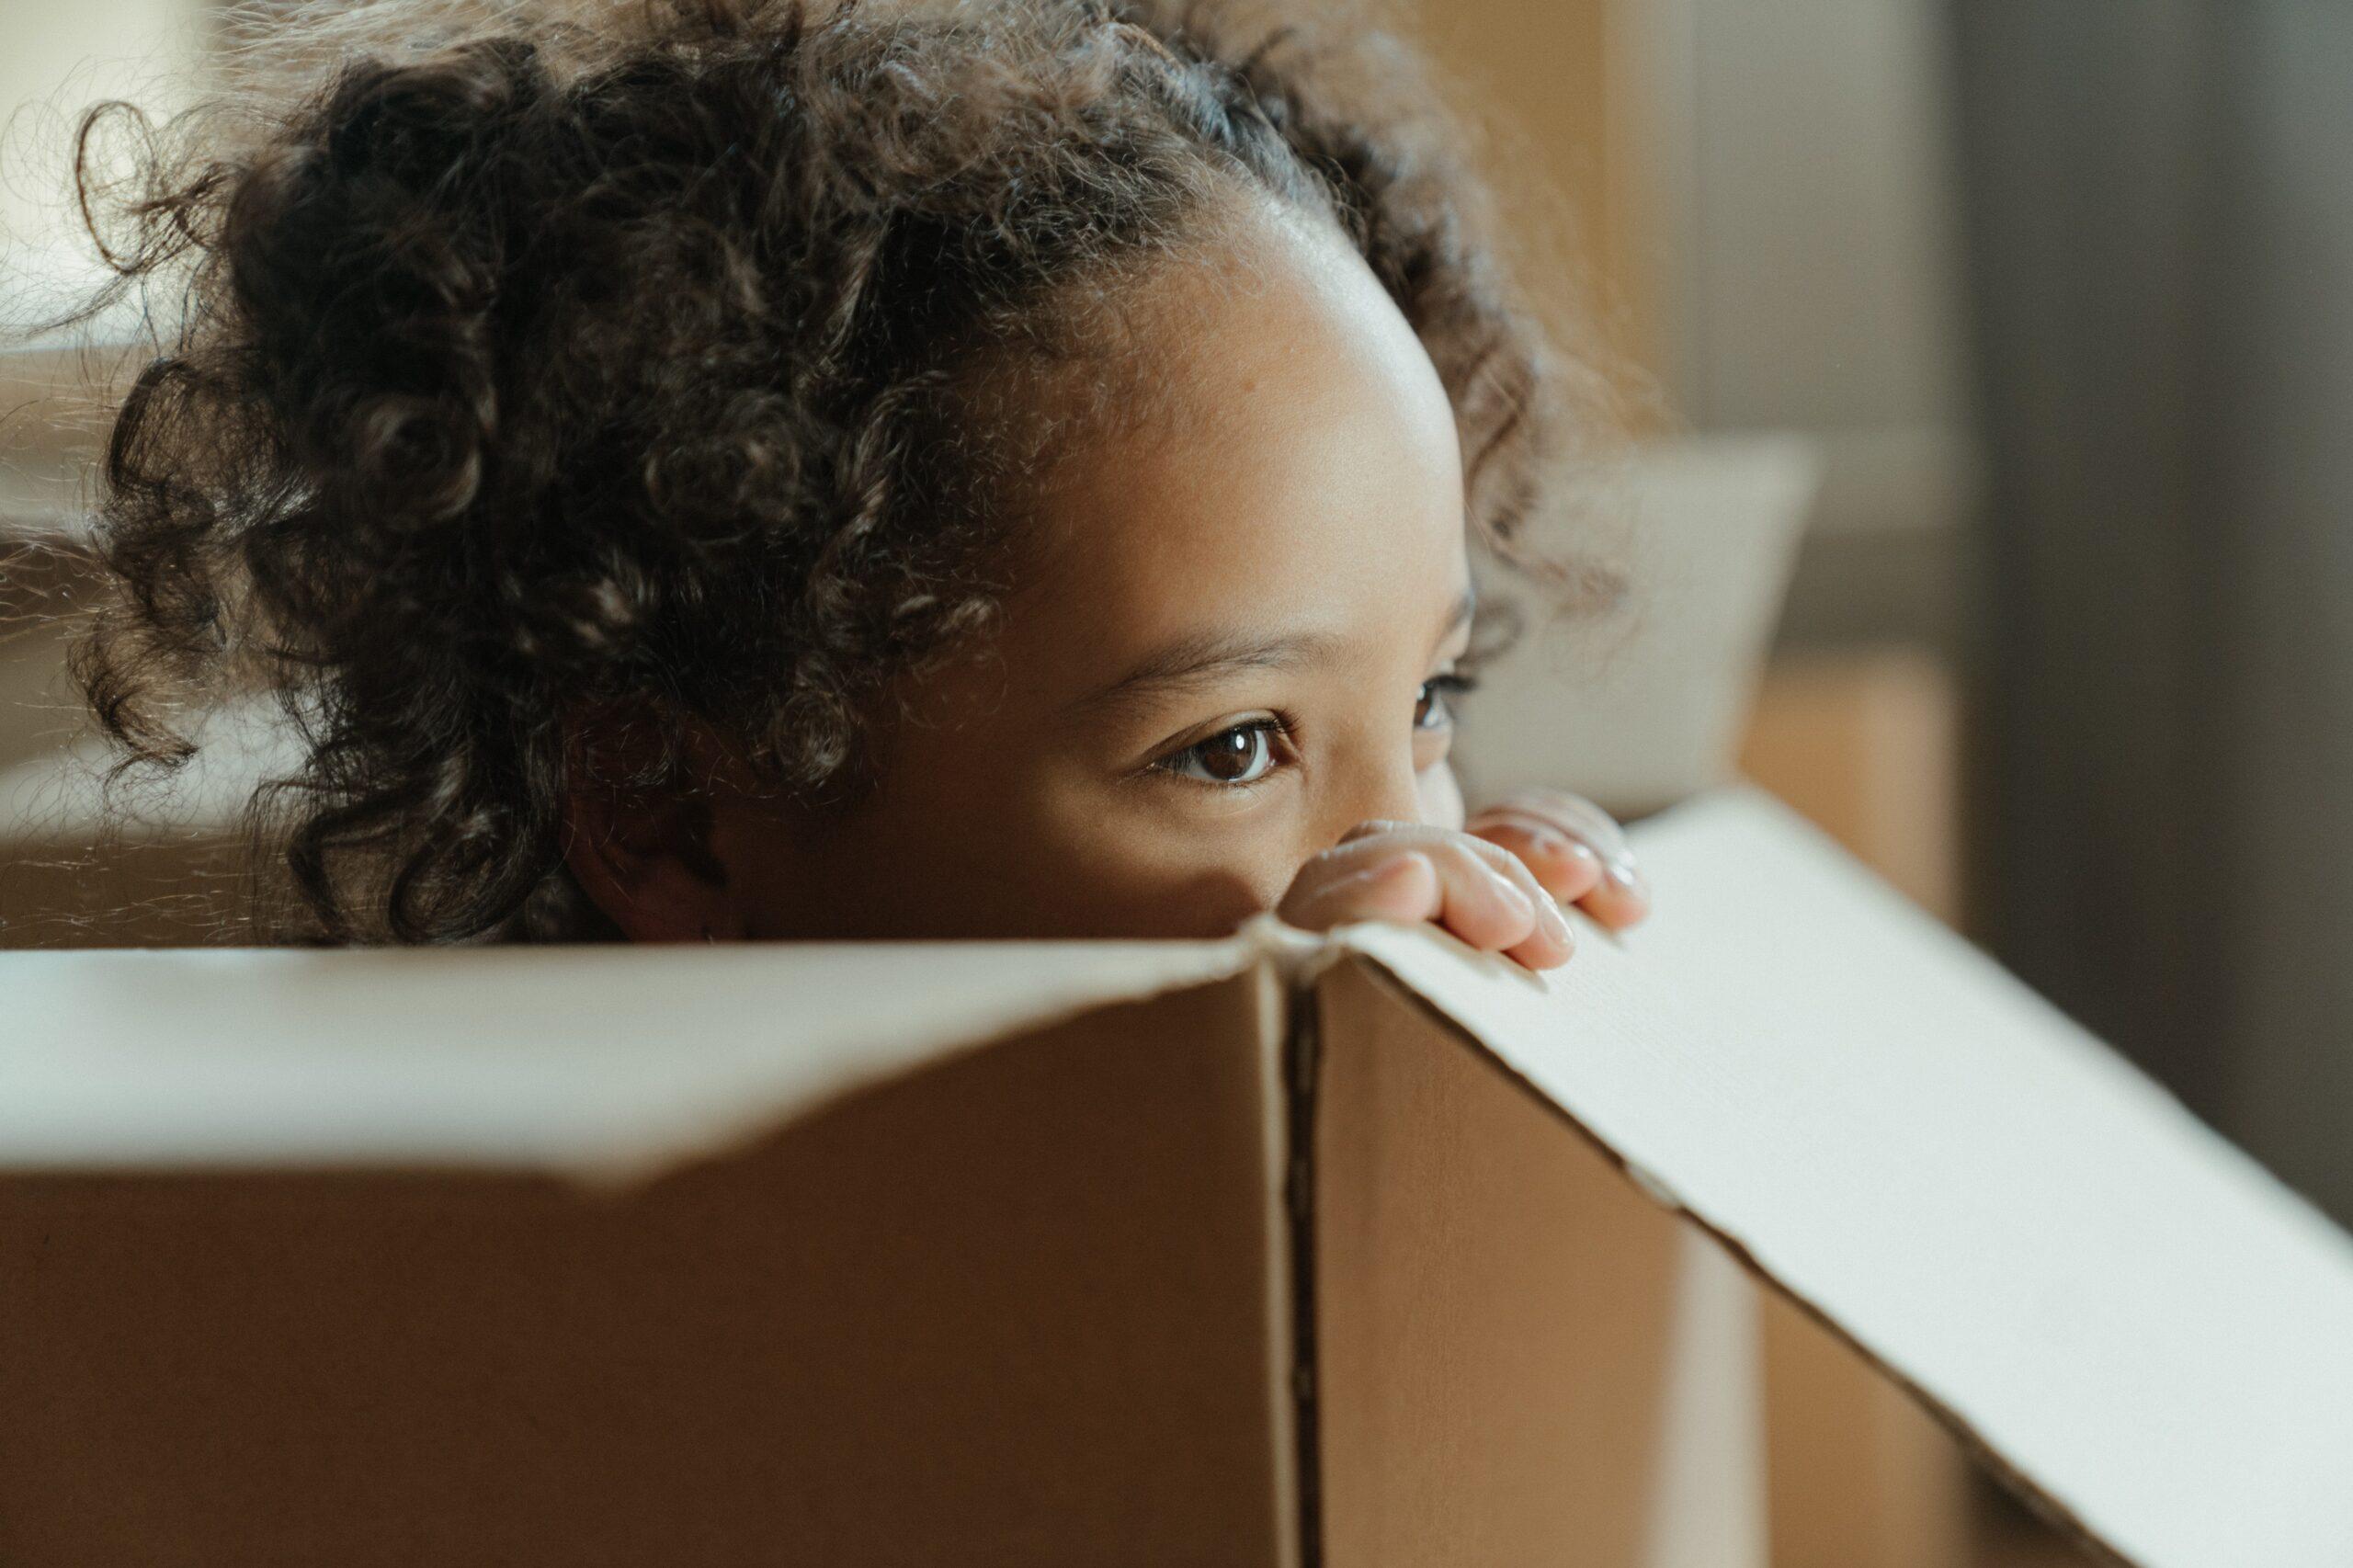 young girl playing in cardboard box